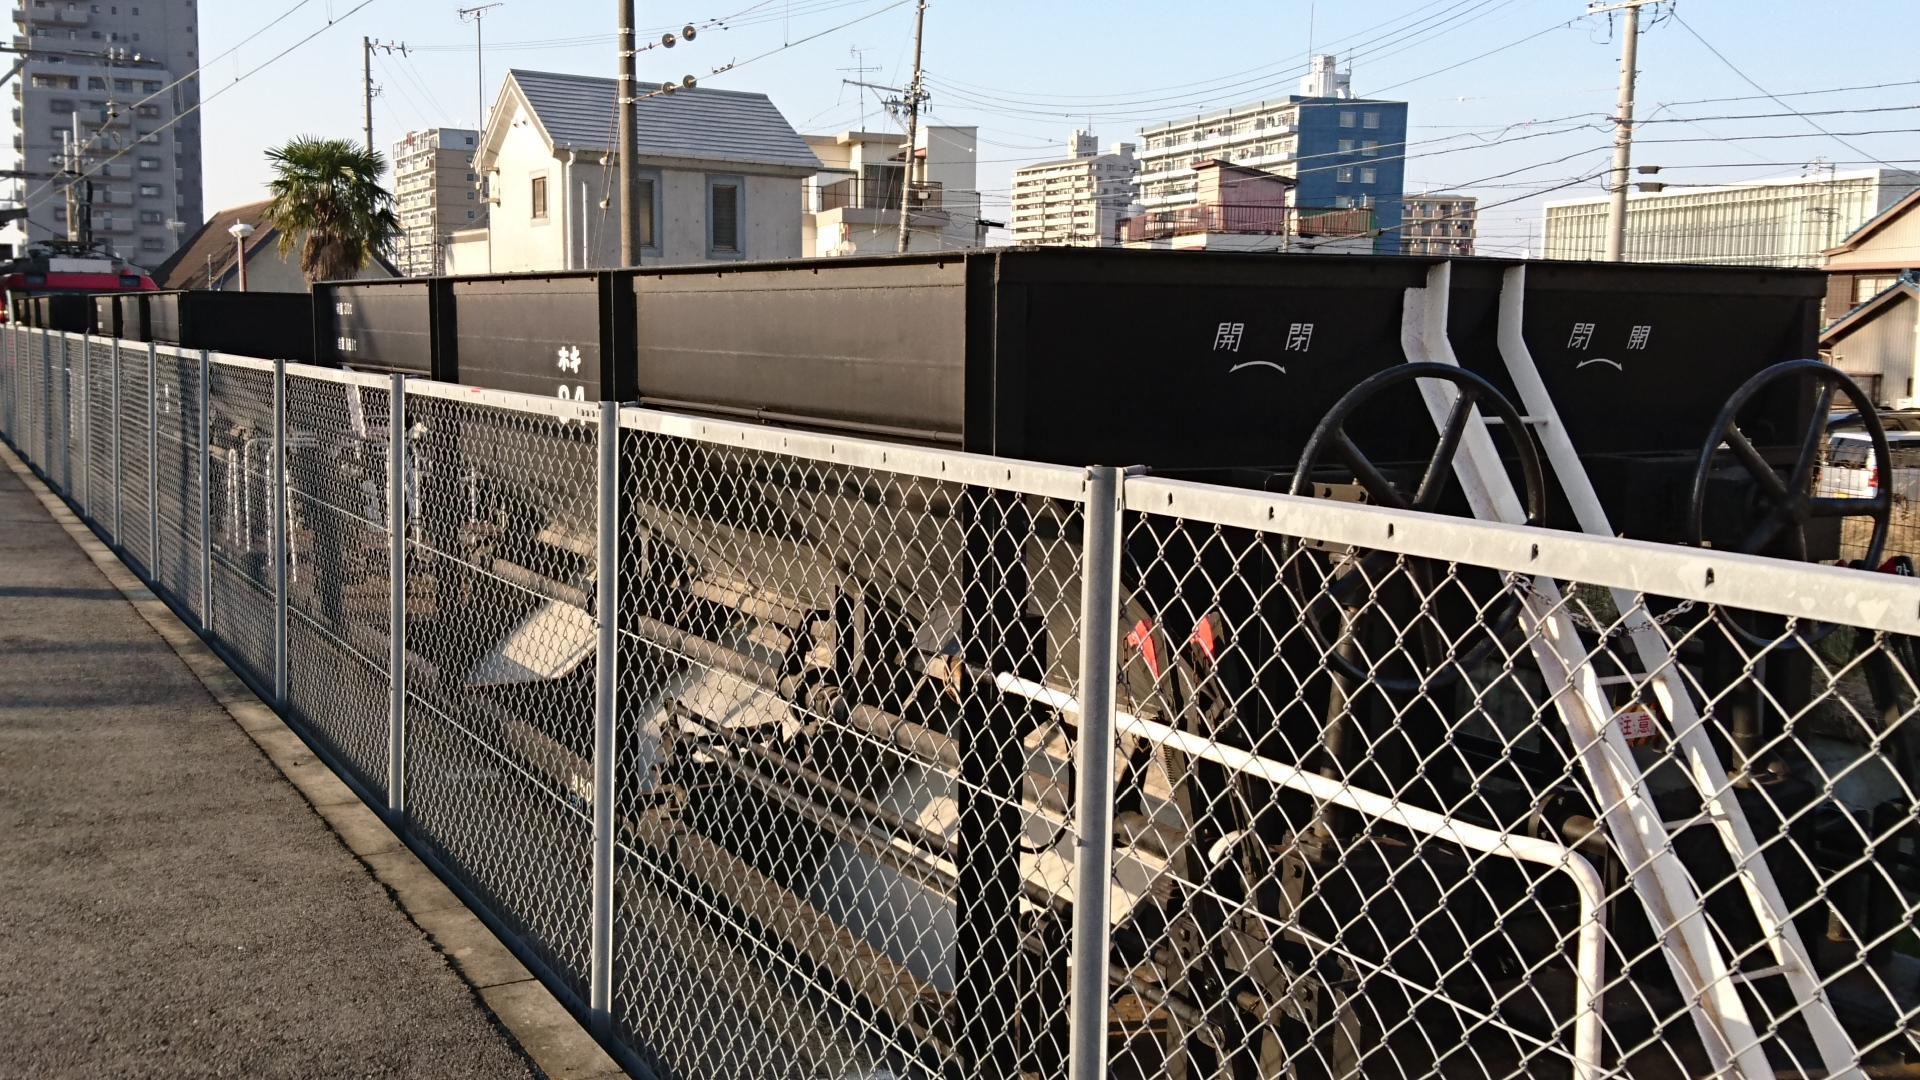 2016.12.18 名鉄 (14) 矢作橋 - 貨車ホキ84-85-86 1920-1080